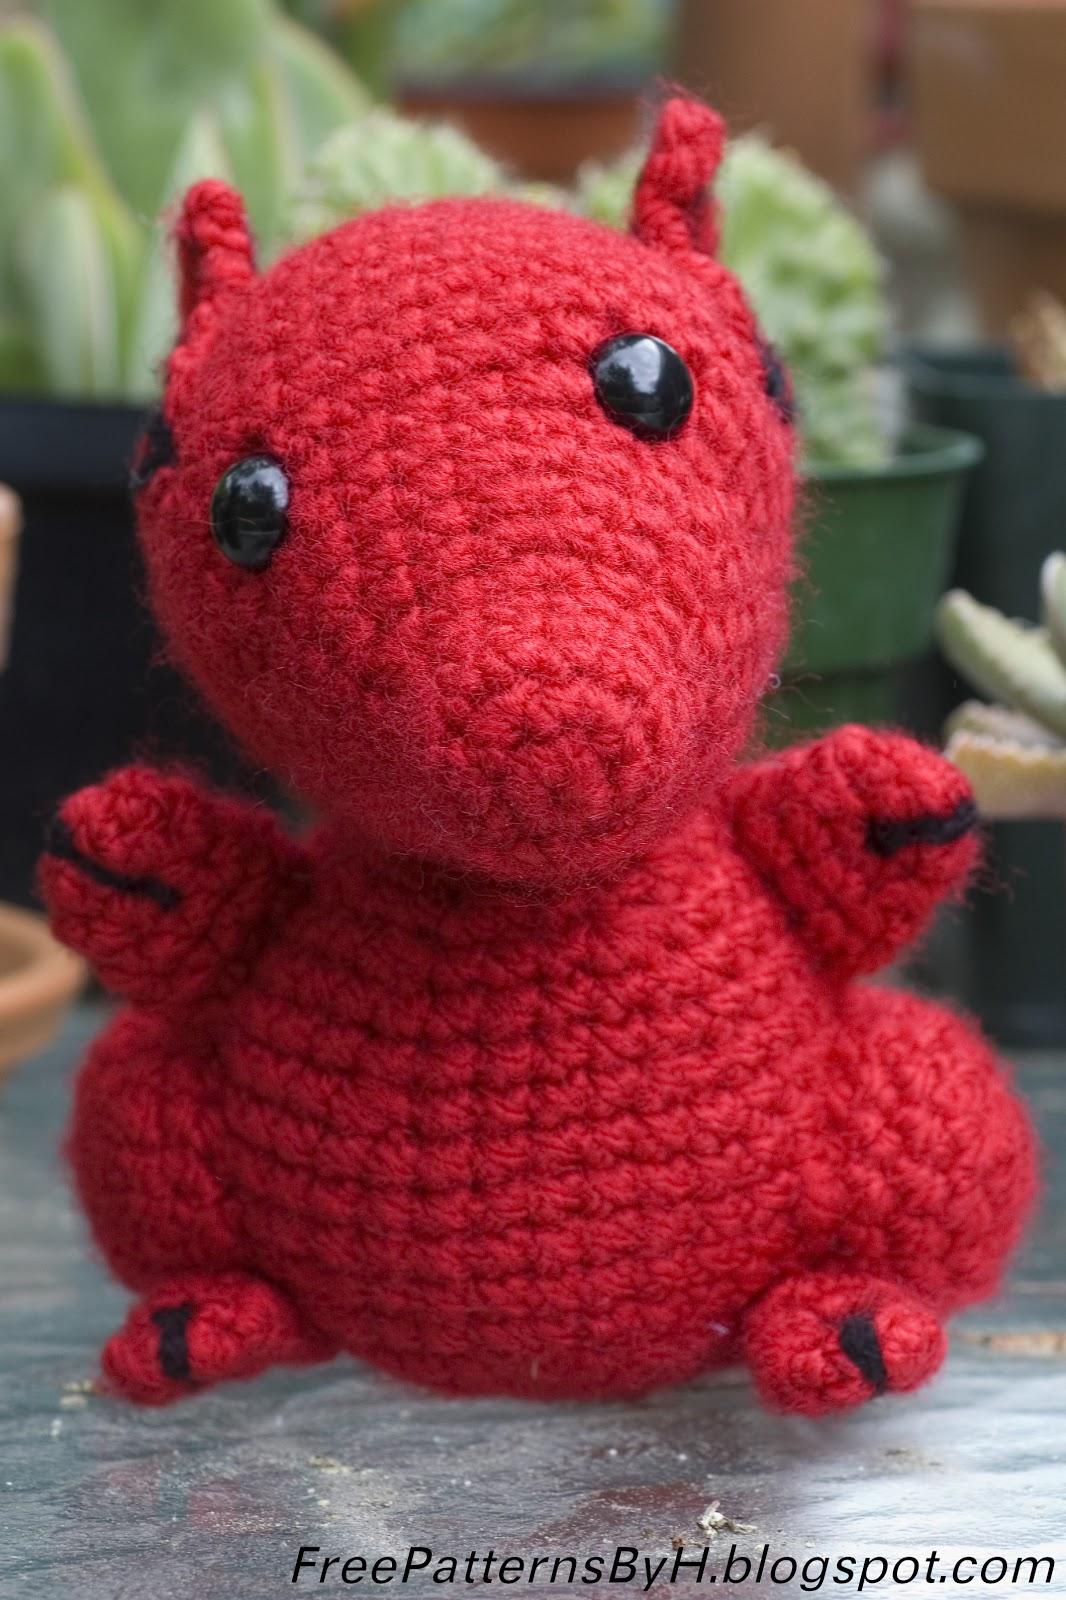 Welsh Dragon Free Crochet Pattern : Free Patterns by H: Hannahs Red Dragon